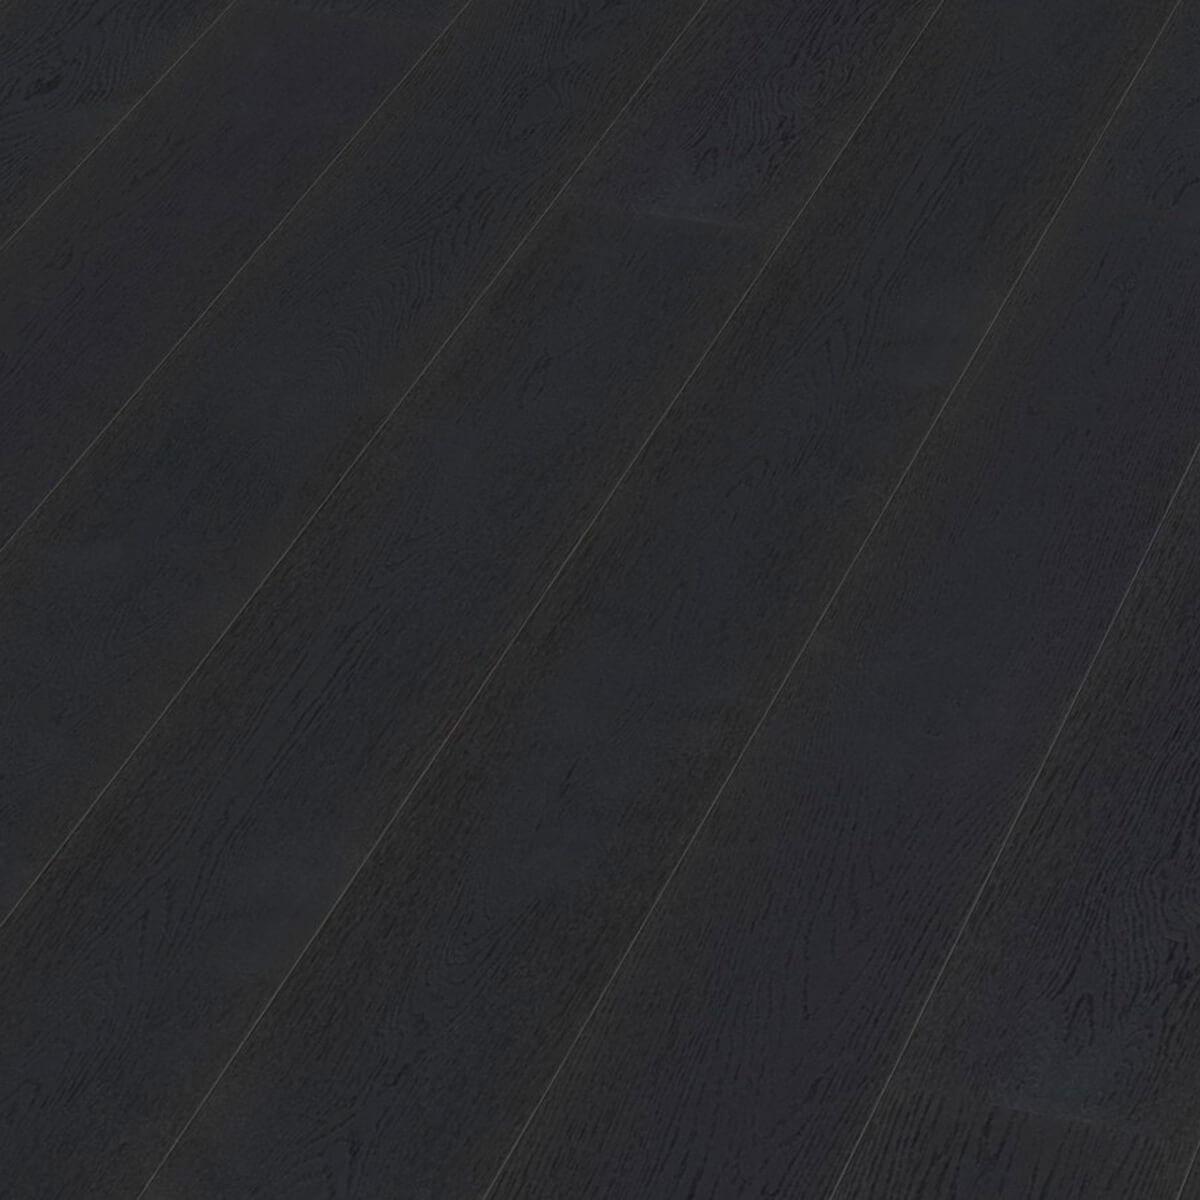 Parchet stratificat stejar ebony lp plank_1